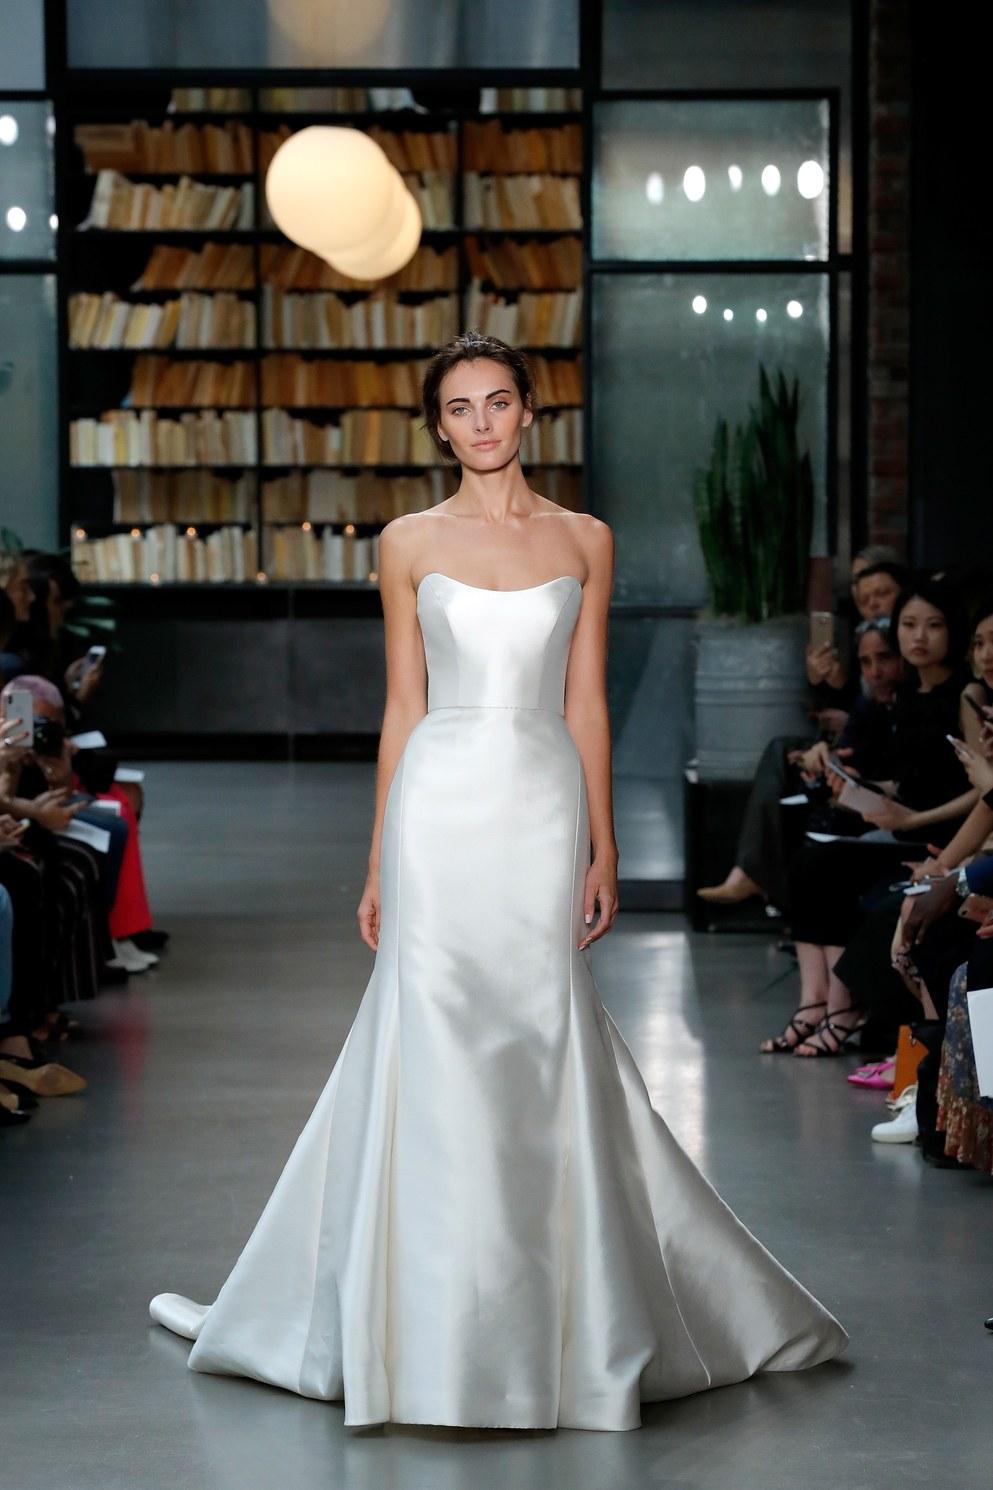 225b2b73de5a How Much Do Amsale Wedding Dresses Cost - PostParc